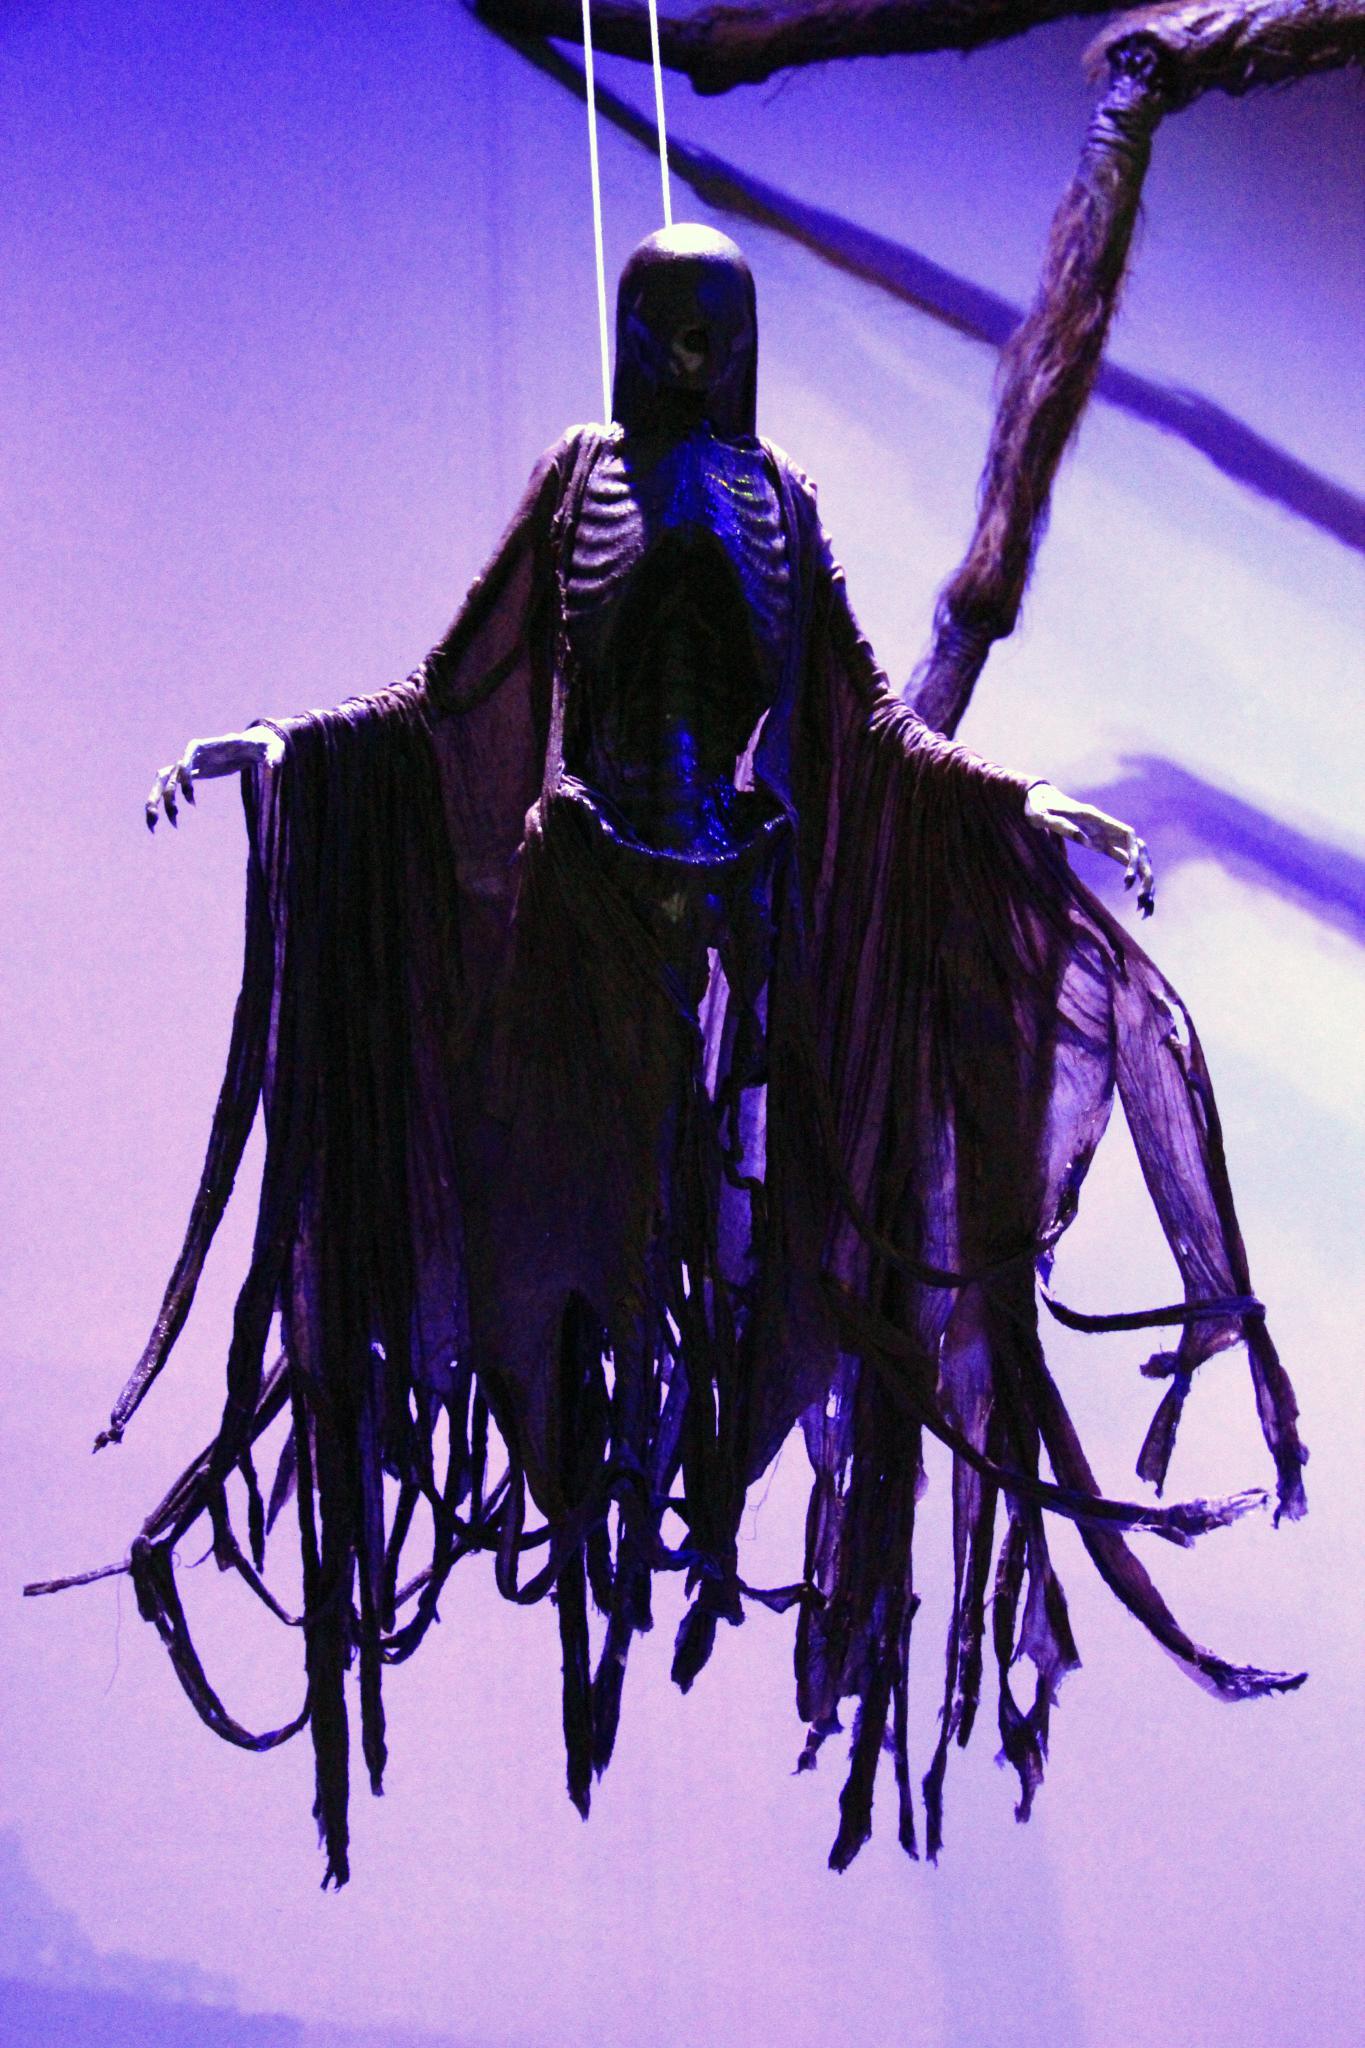 Dementor Simple English Wikipedia The Free Encyclopedia